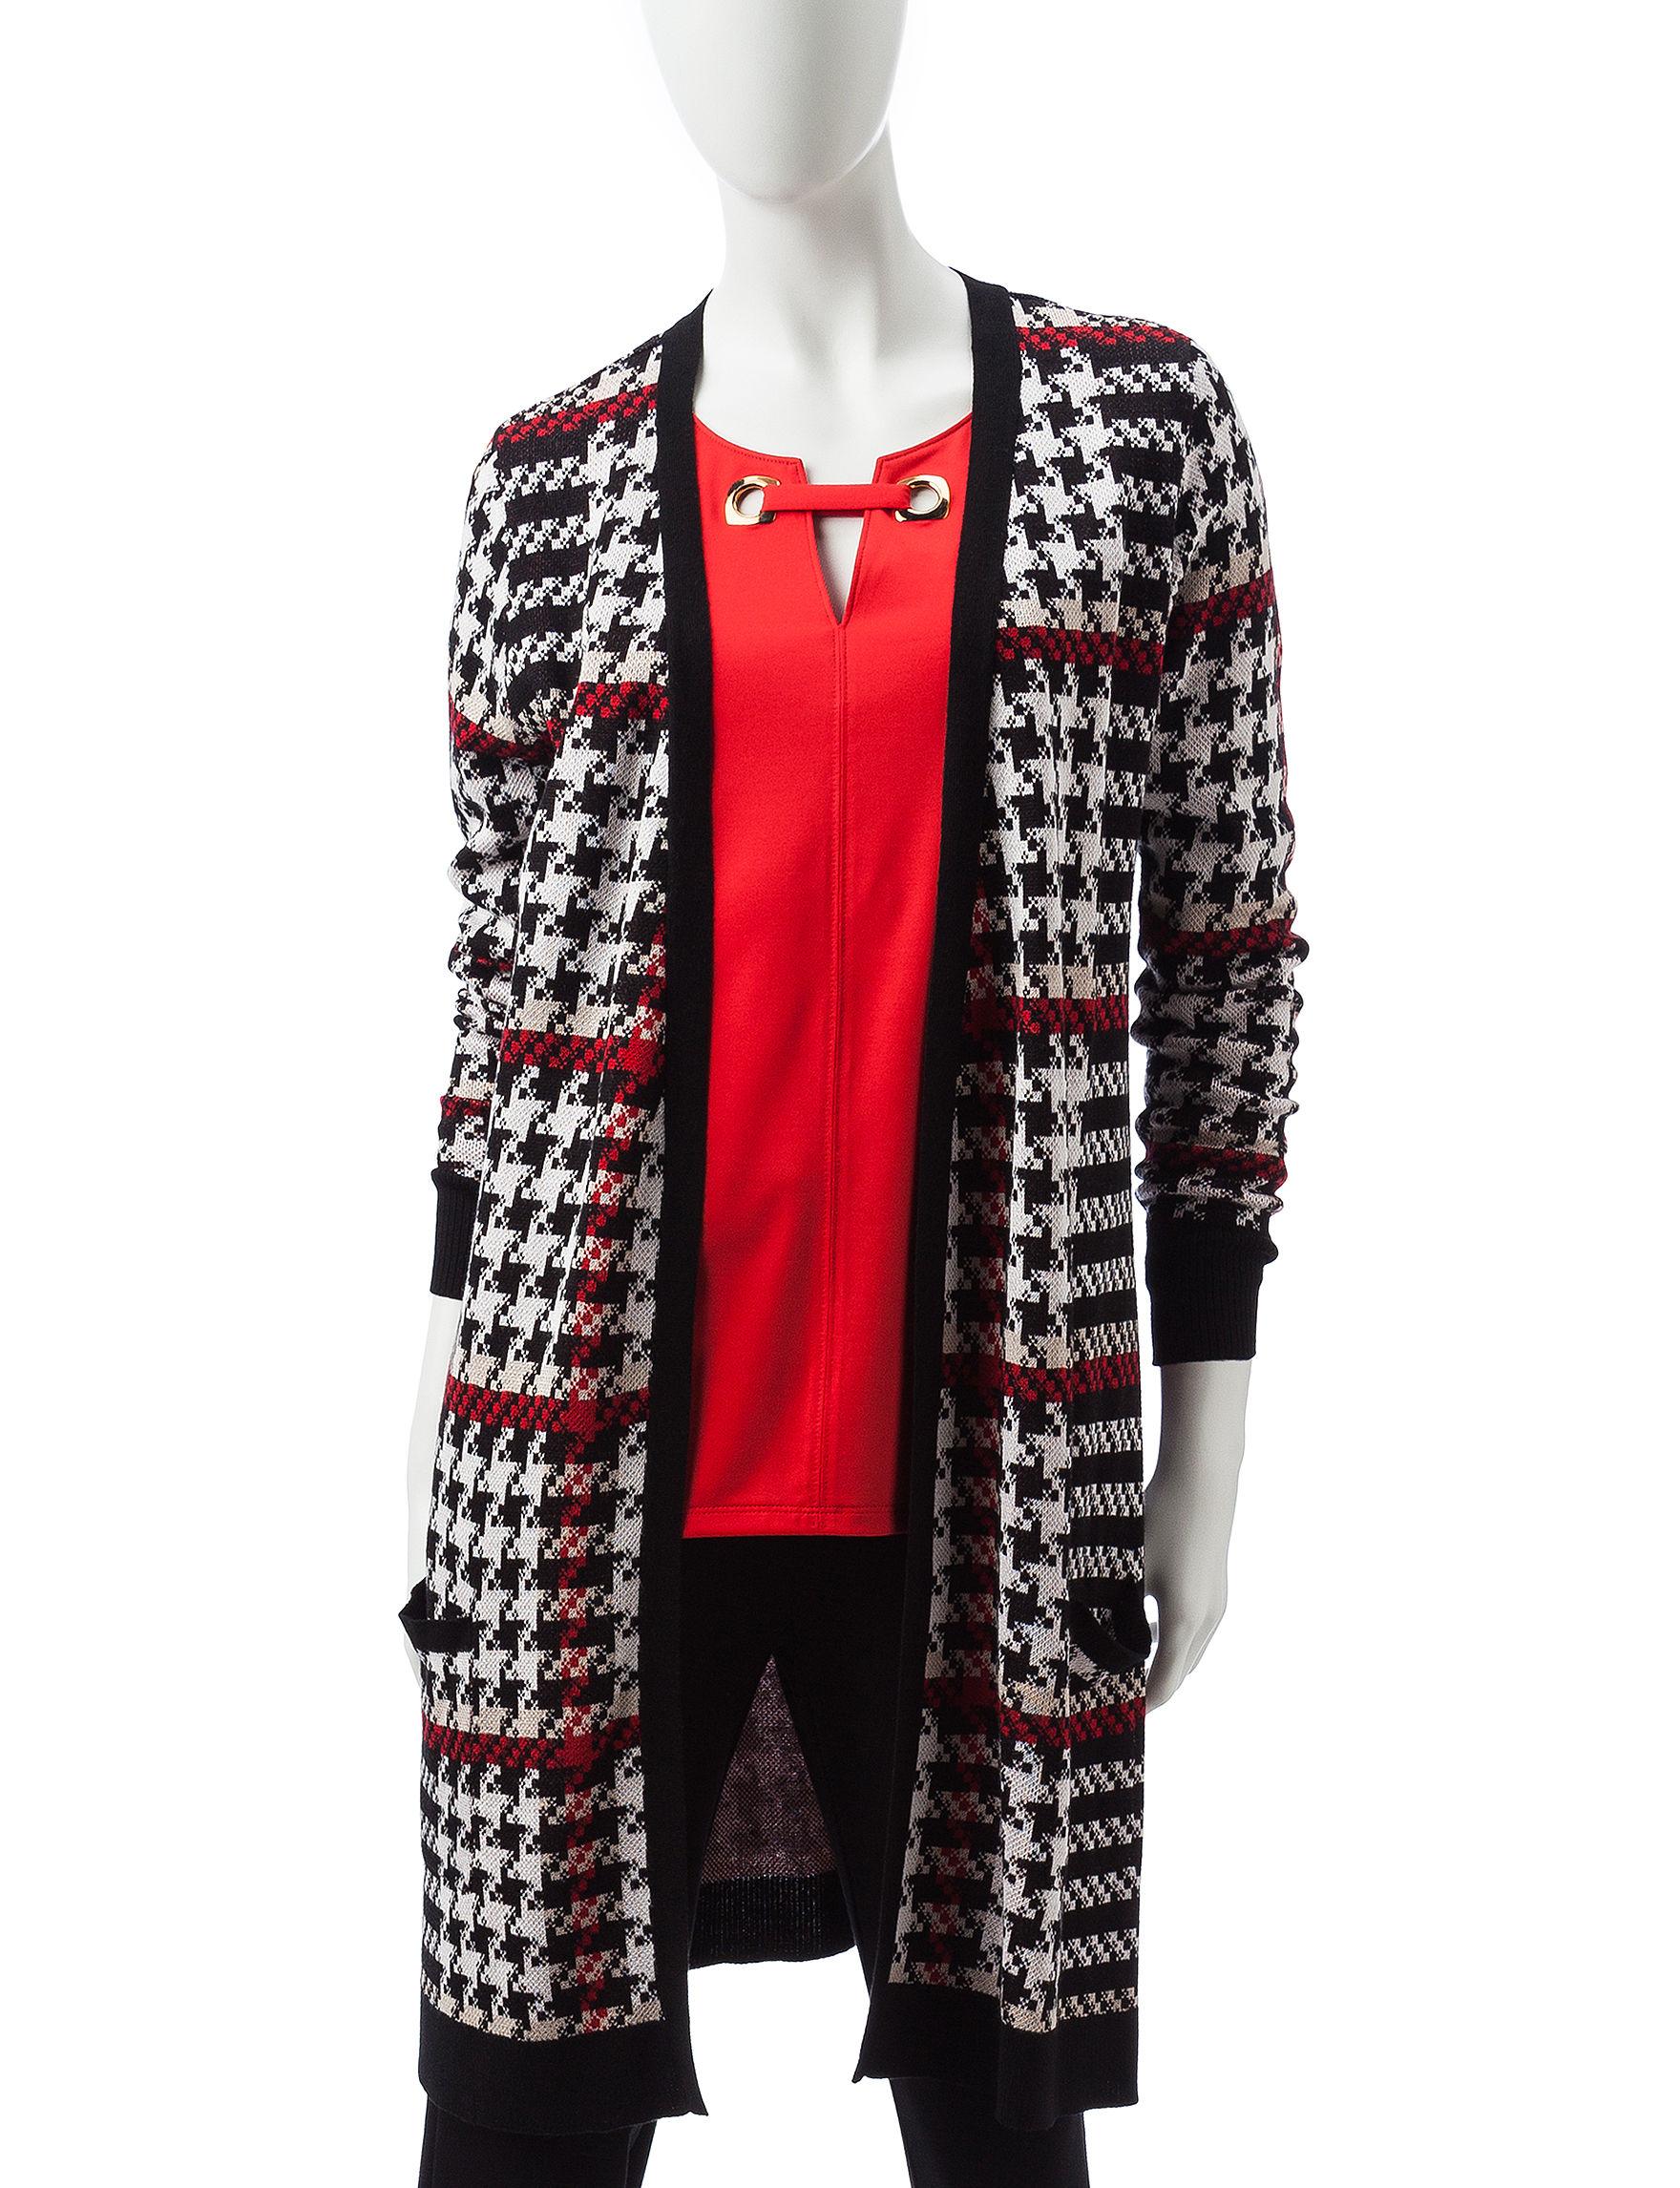 Valerie Stevens Red Cardigans Sweaters